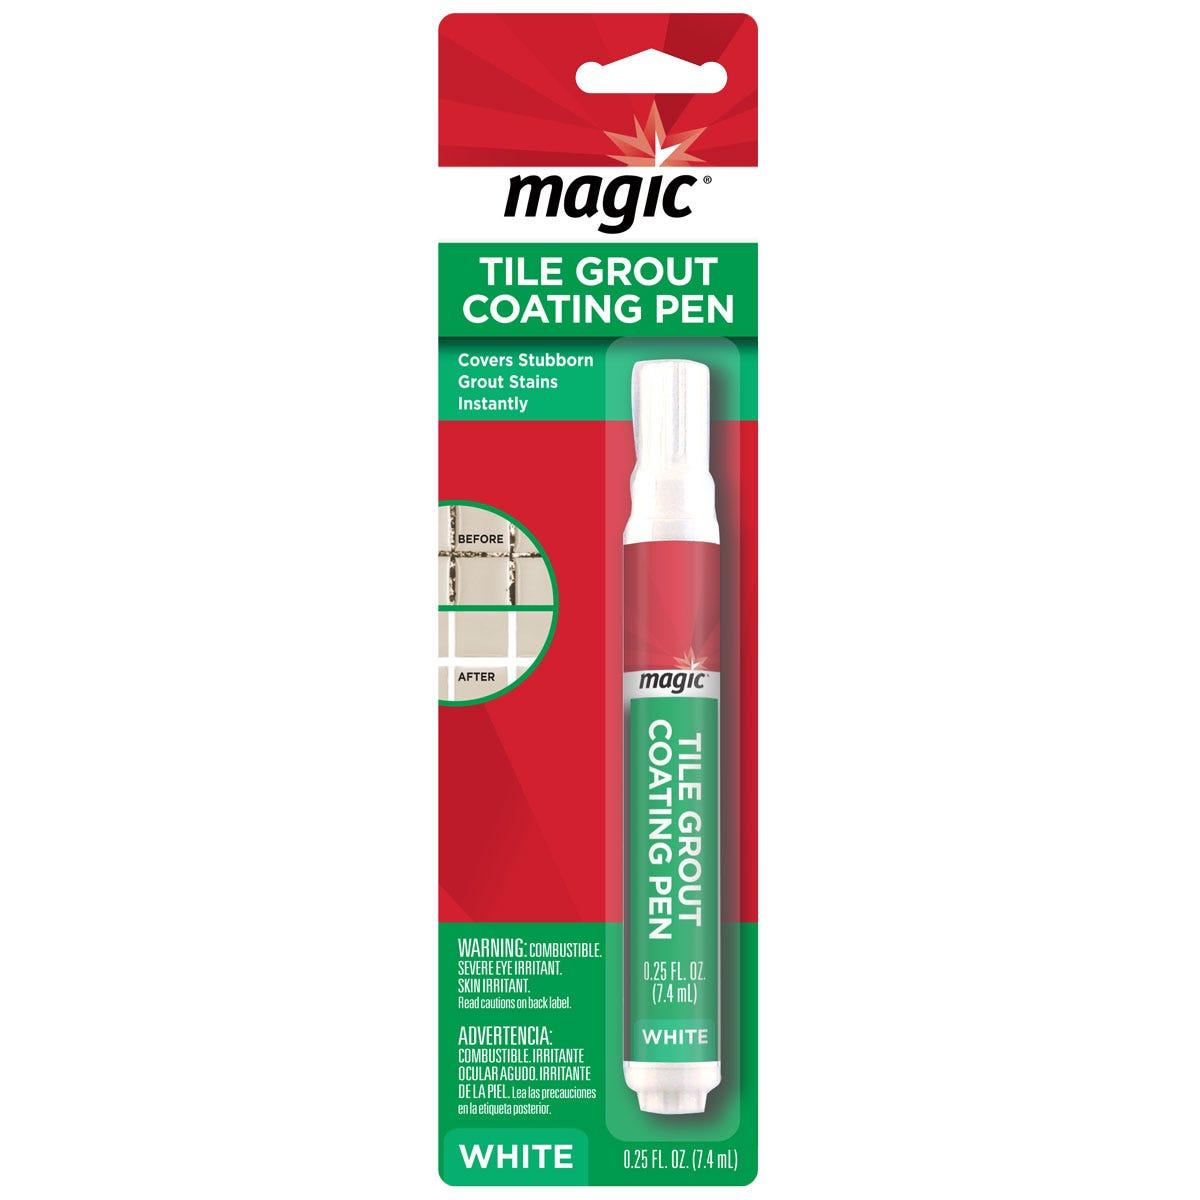 https://googone.com/media/catalog/product/m/a/magic-grout-coating-pen_front.jpg